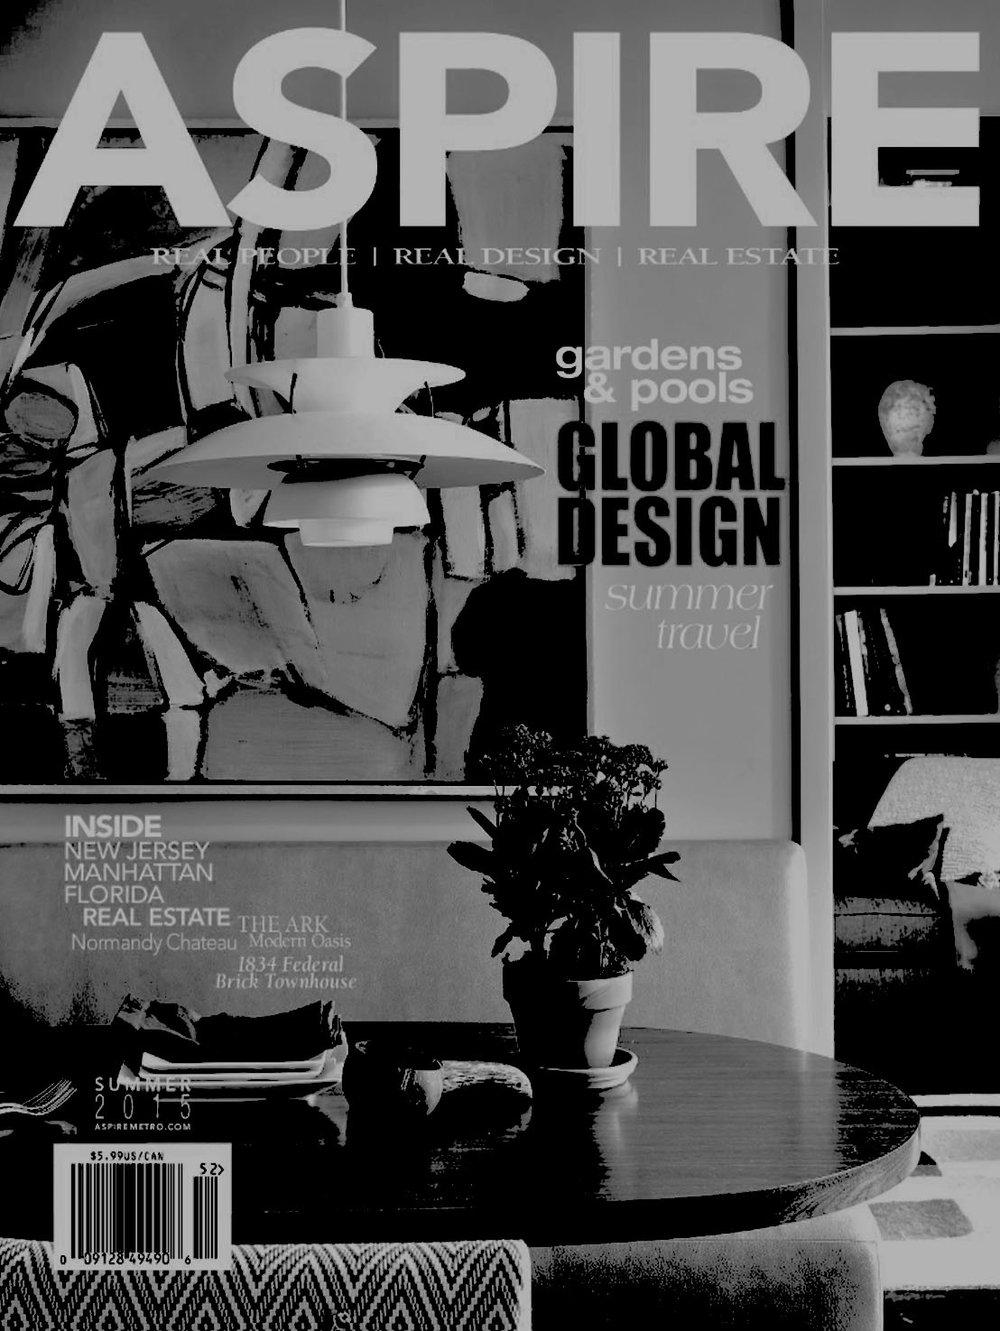 Hotel Design Company New York, New York | Joe Ginsberg Design| 10013